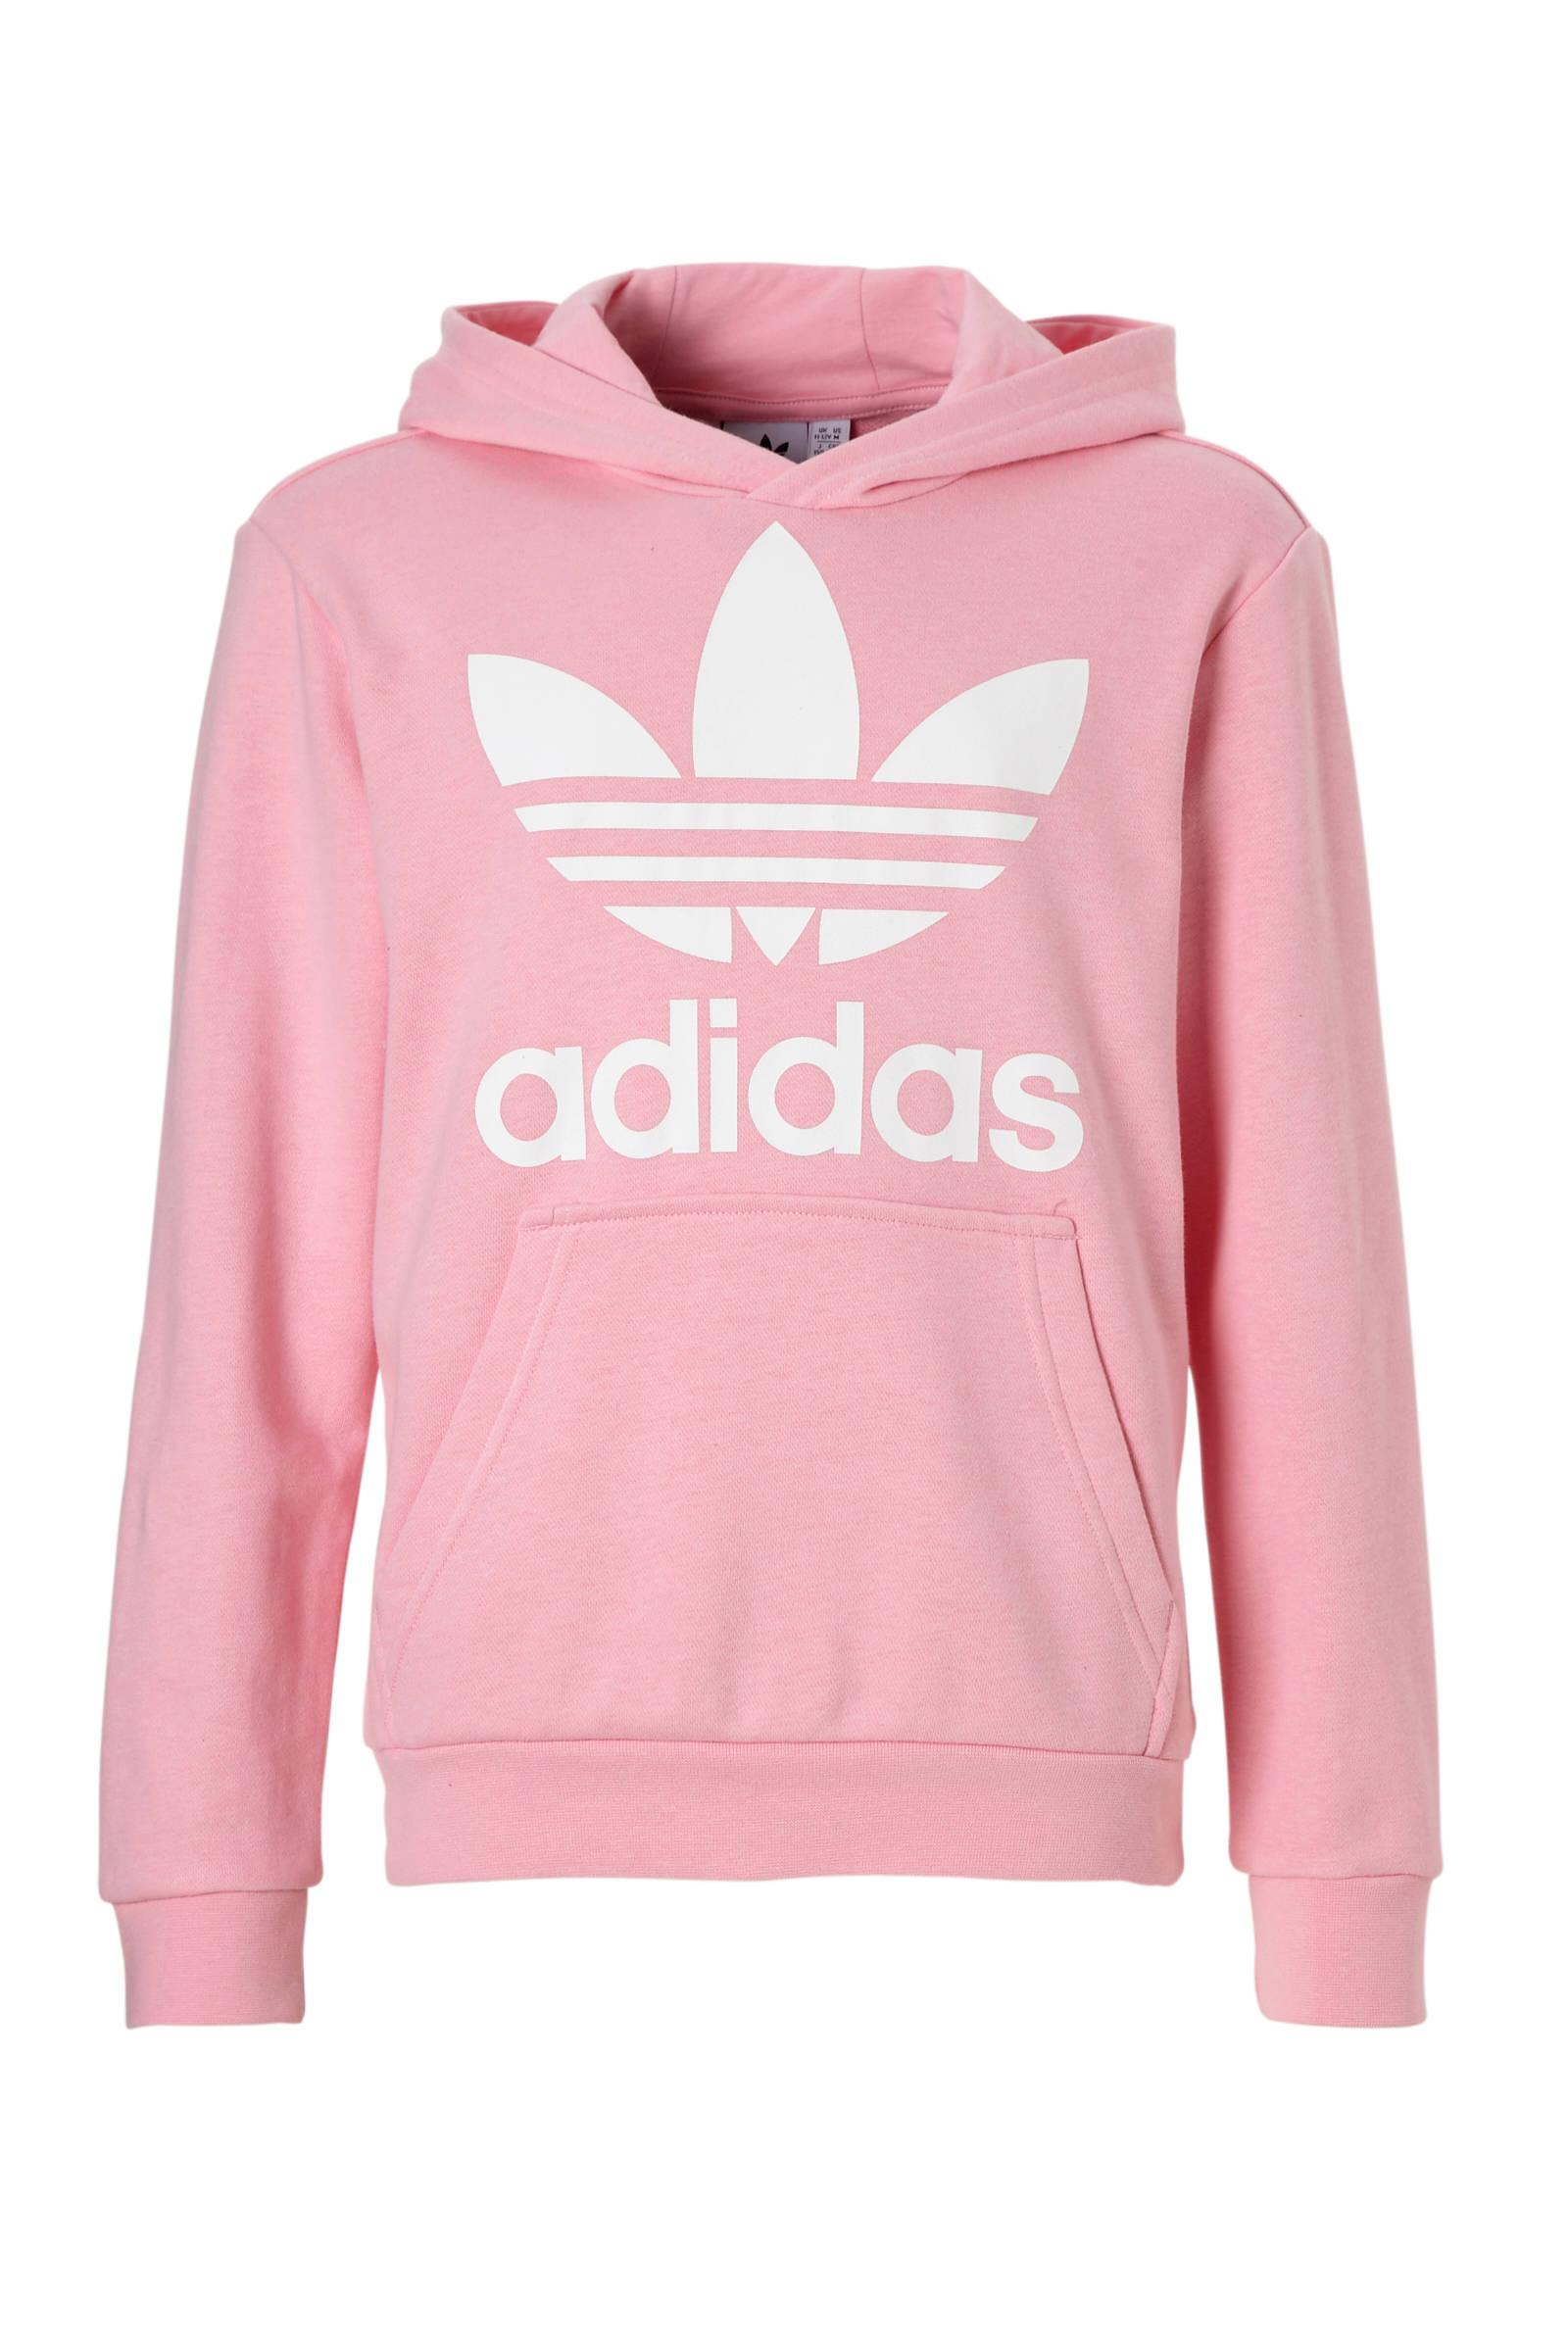 adidas Originals hoodie roze | wehkamp